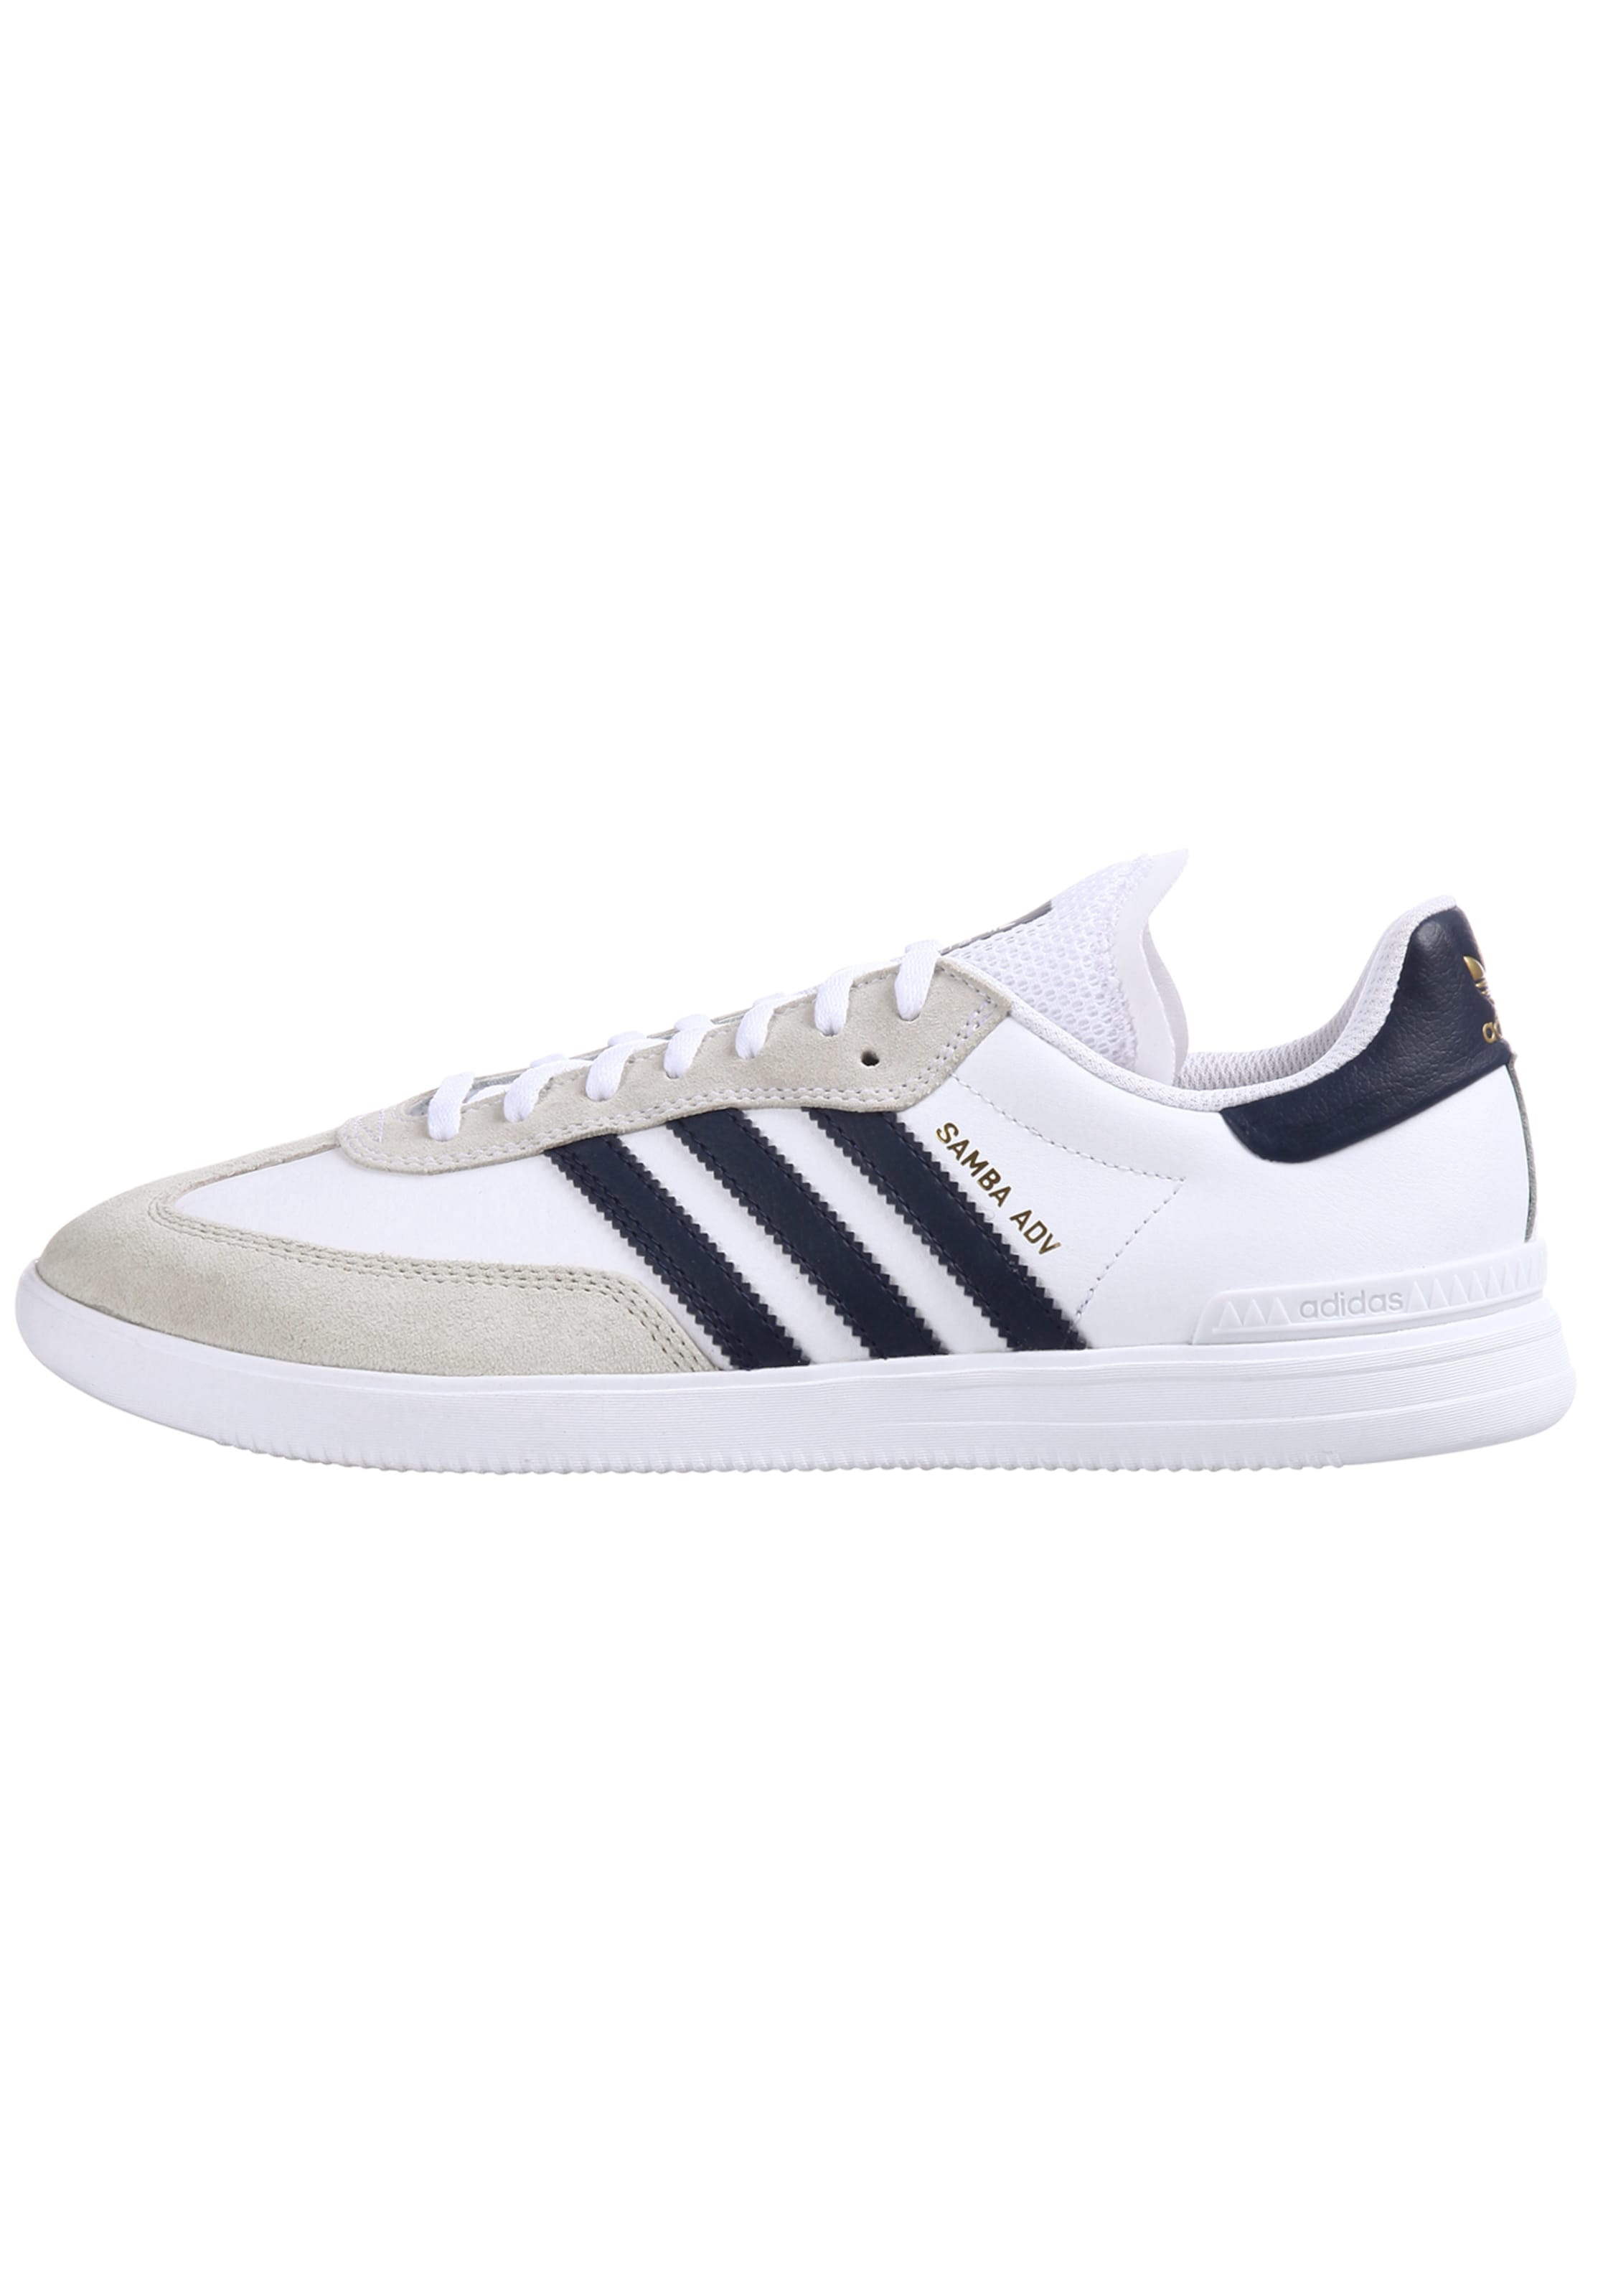 ADIDAS ORIGINALS  Samba Adv  Sneaker